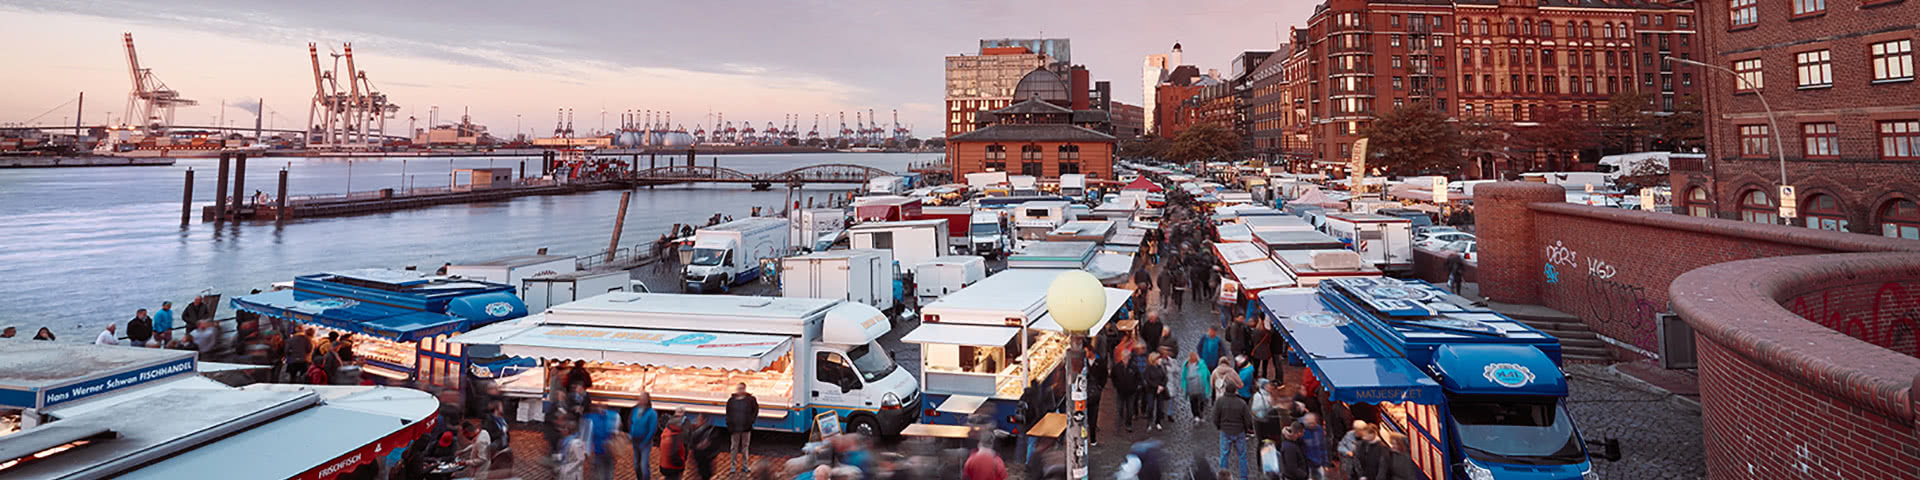 Hamburger Fischmarkt bei Morgendämmerung